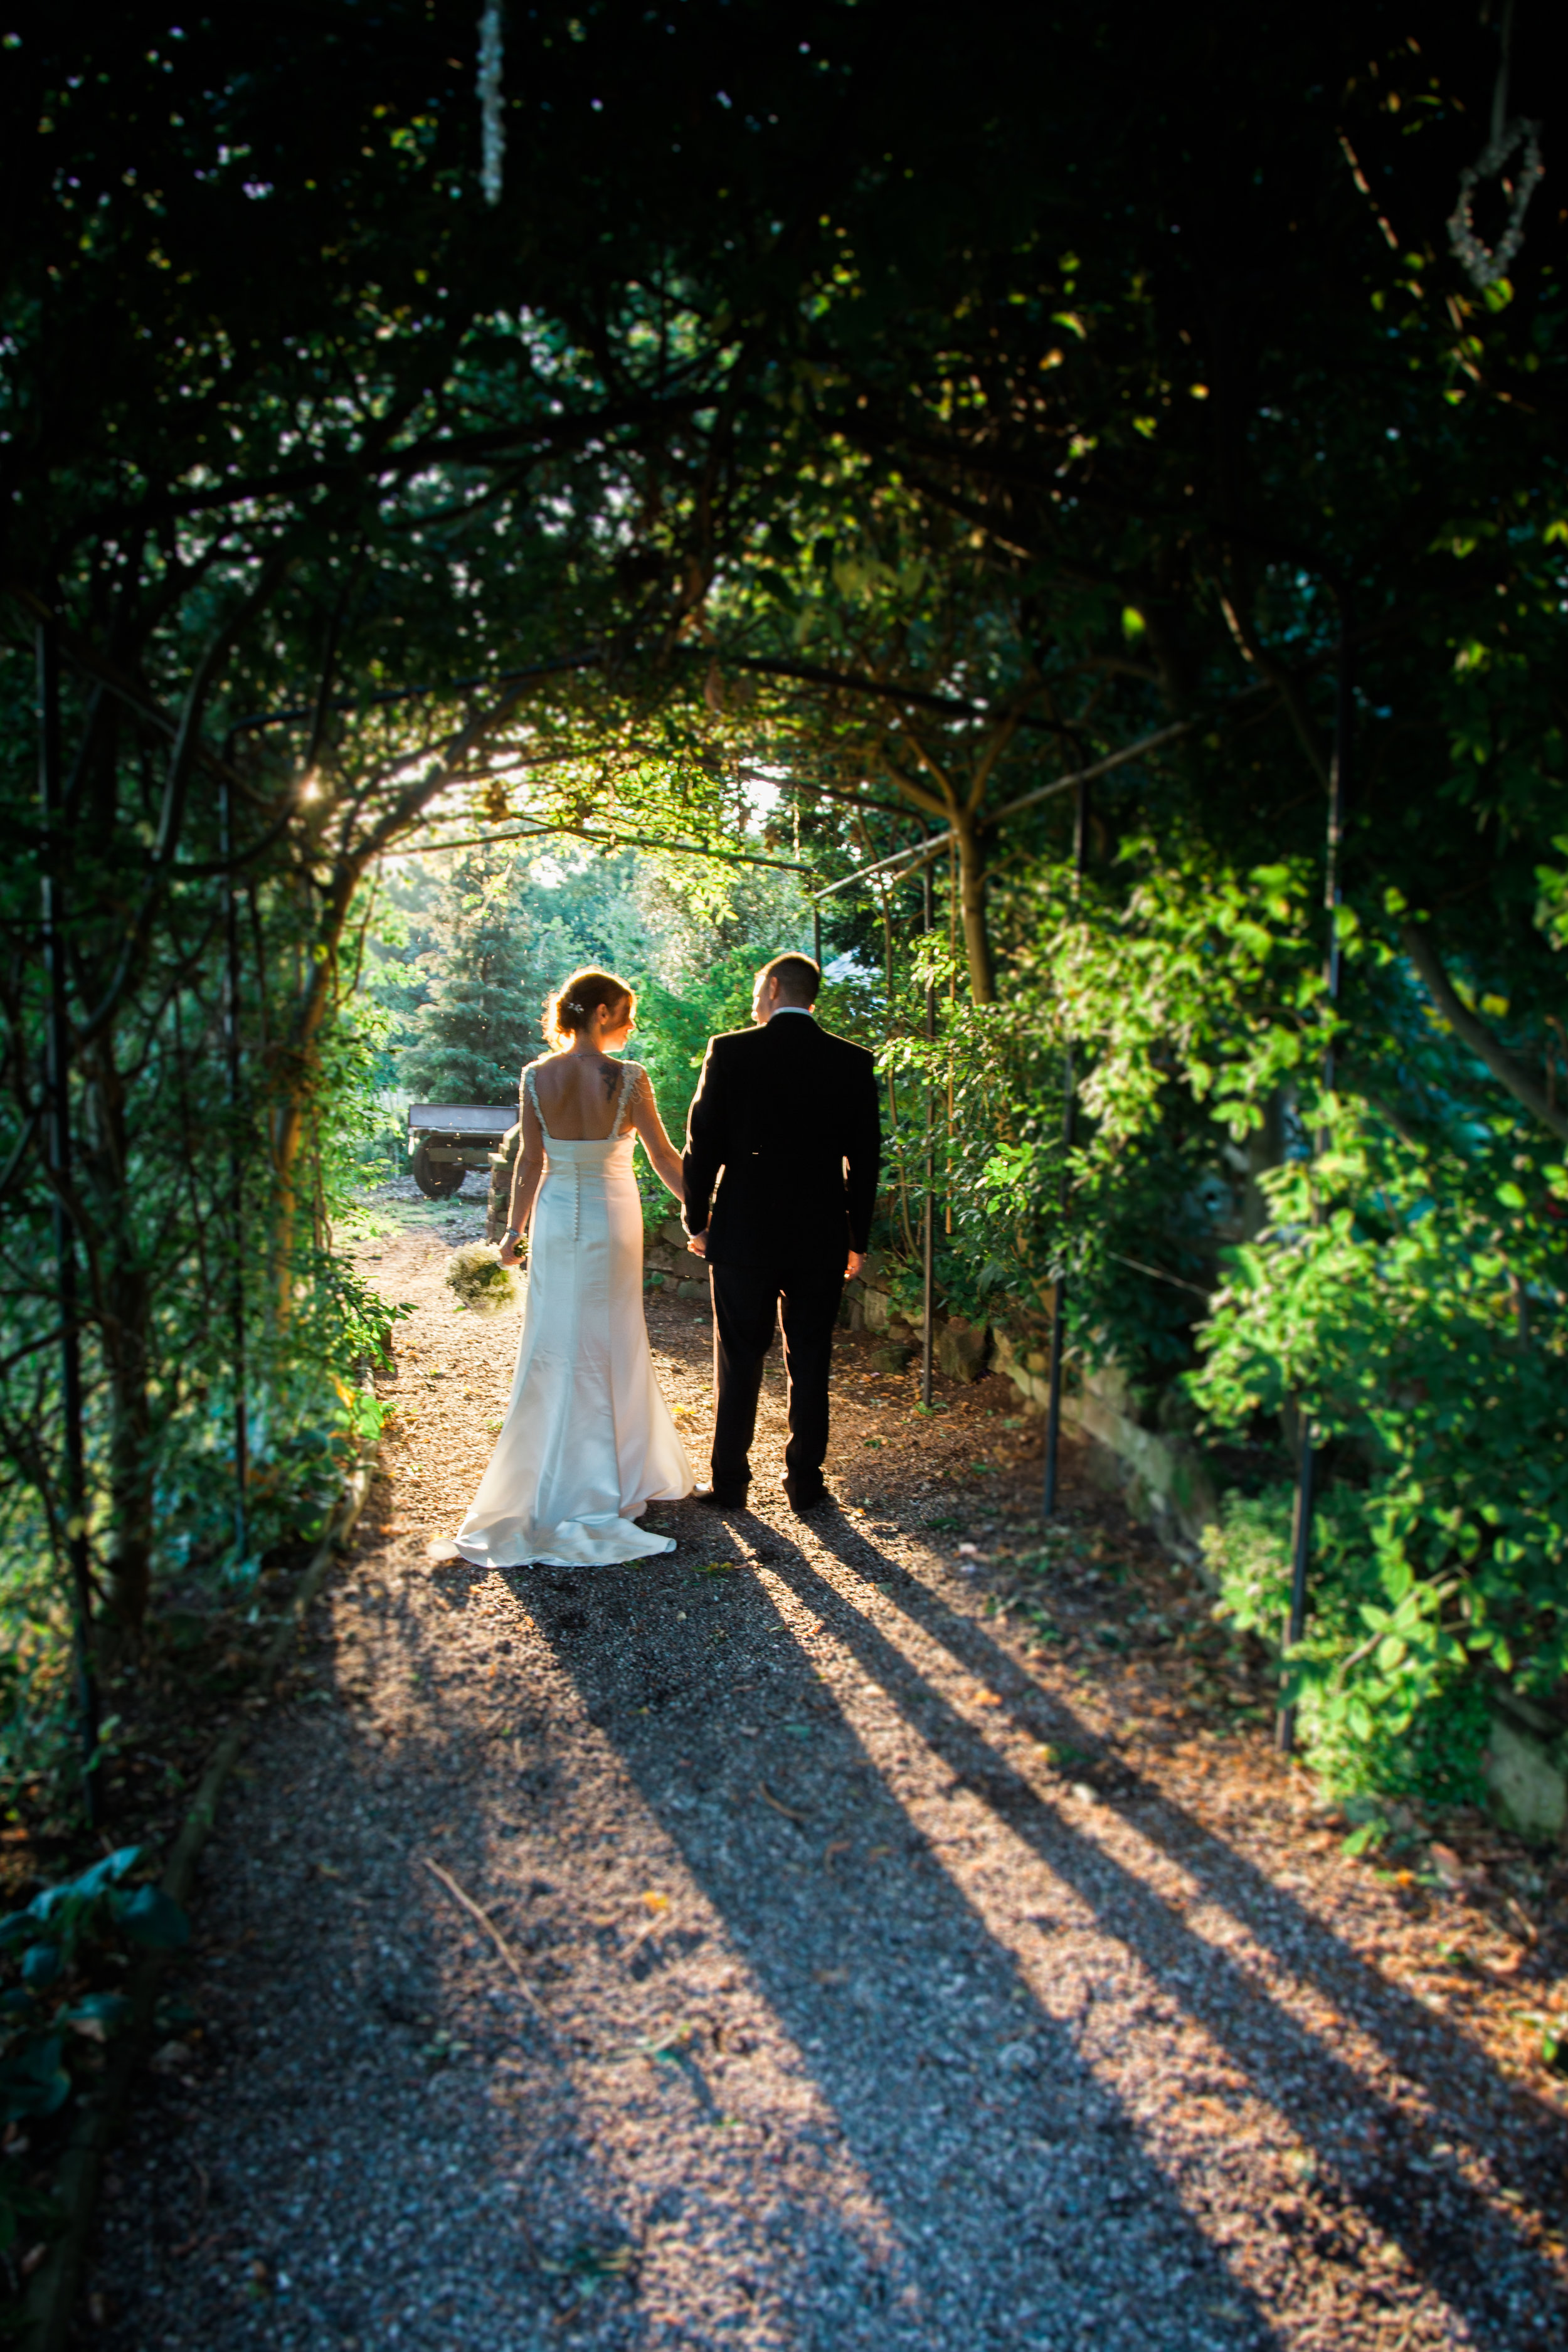 Rachel and Rick - Willington Hall wedding, Cheshire.